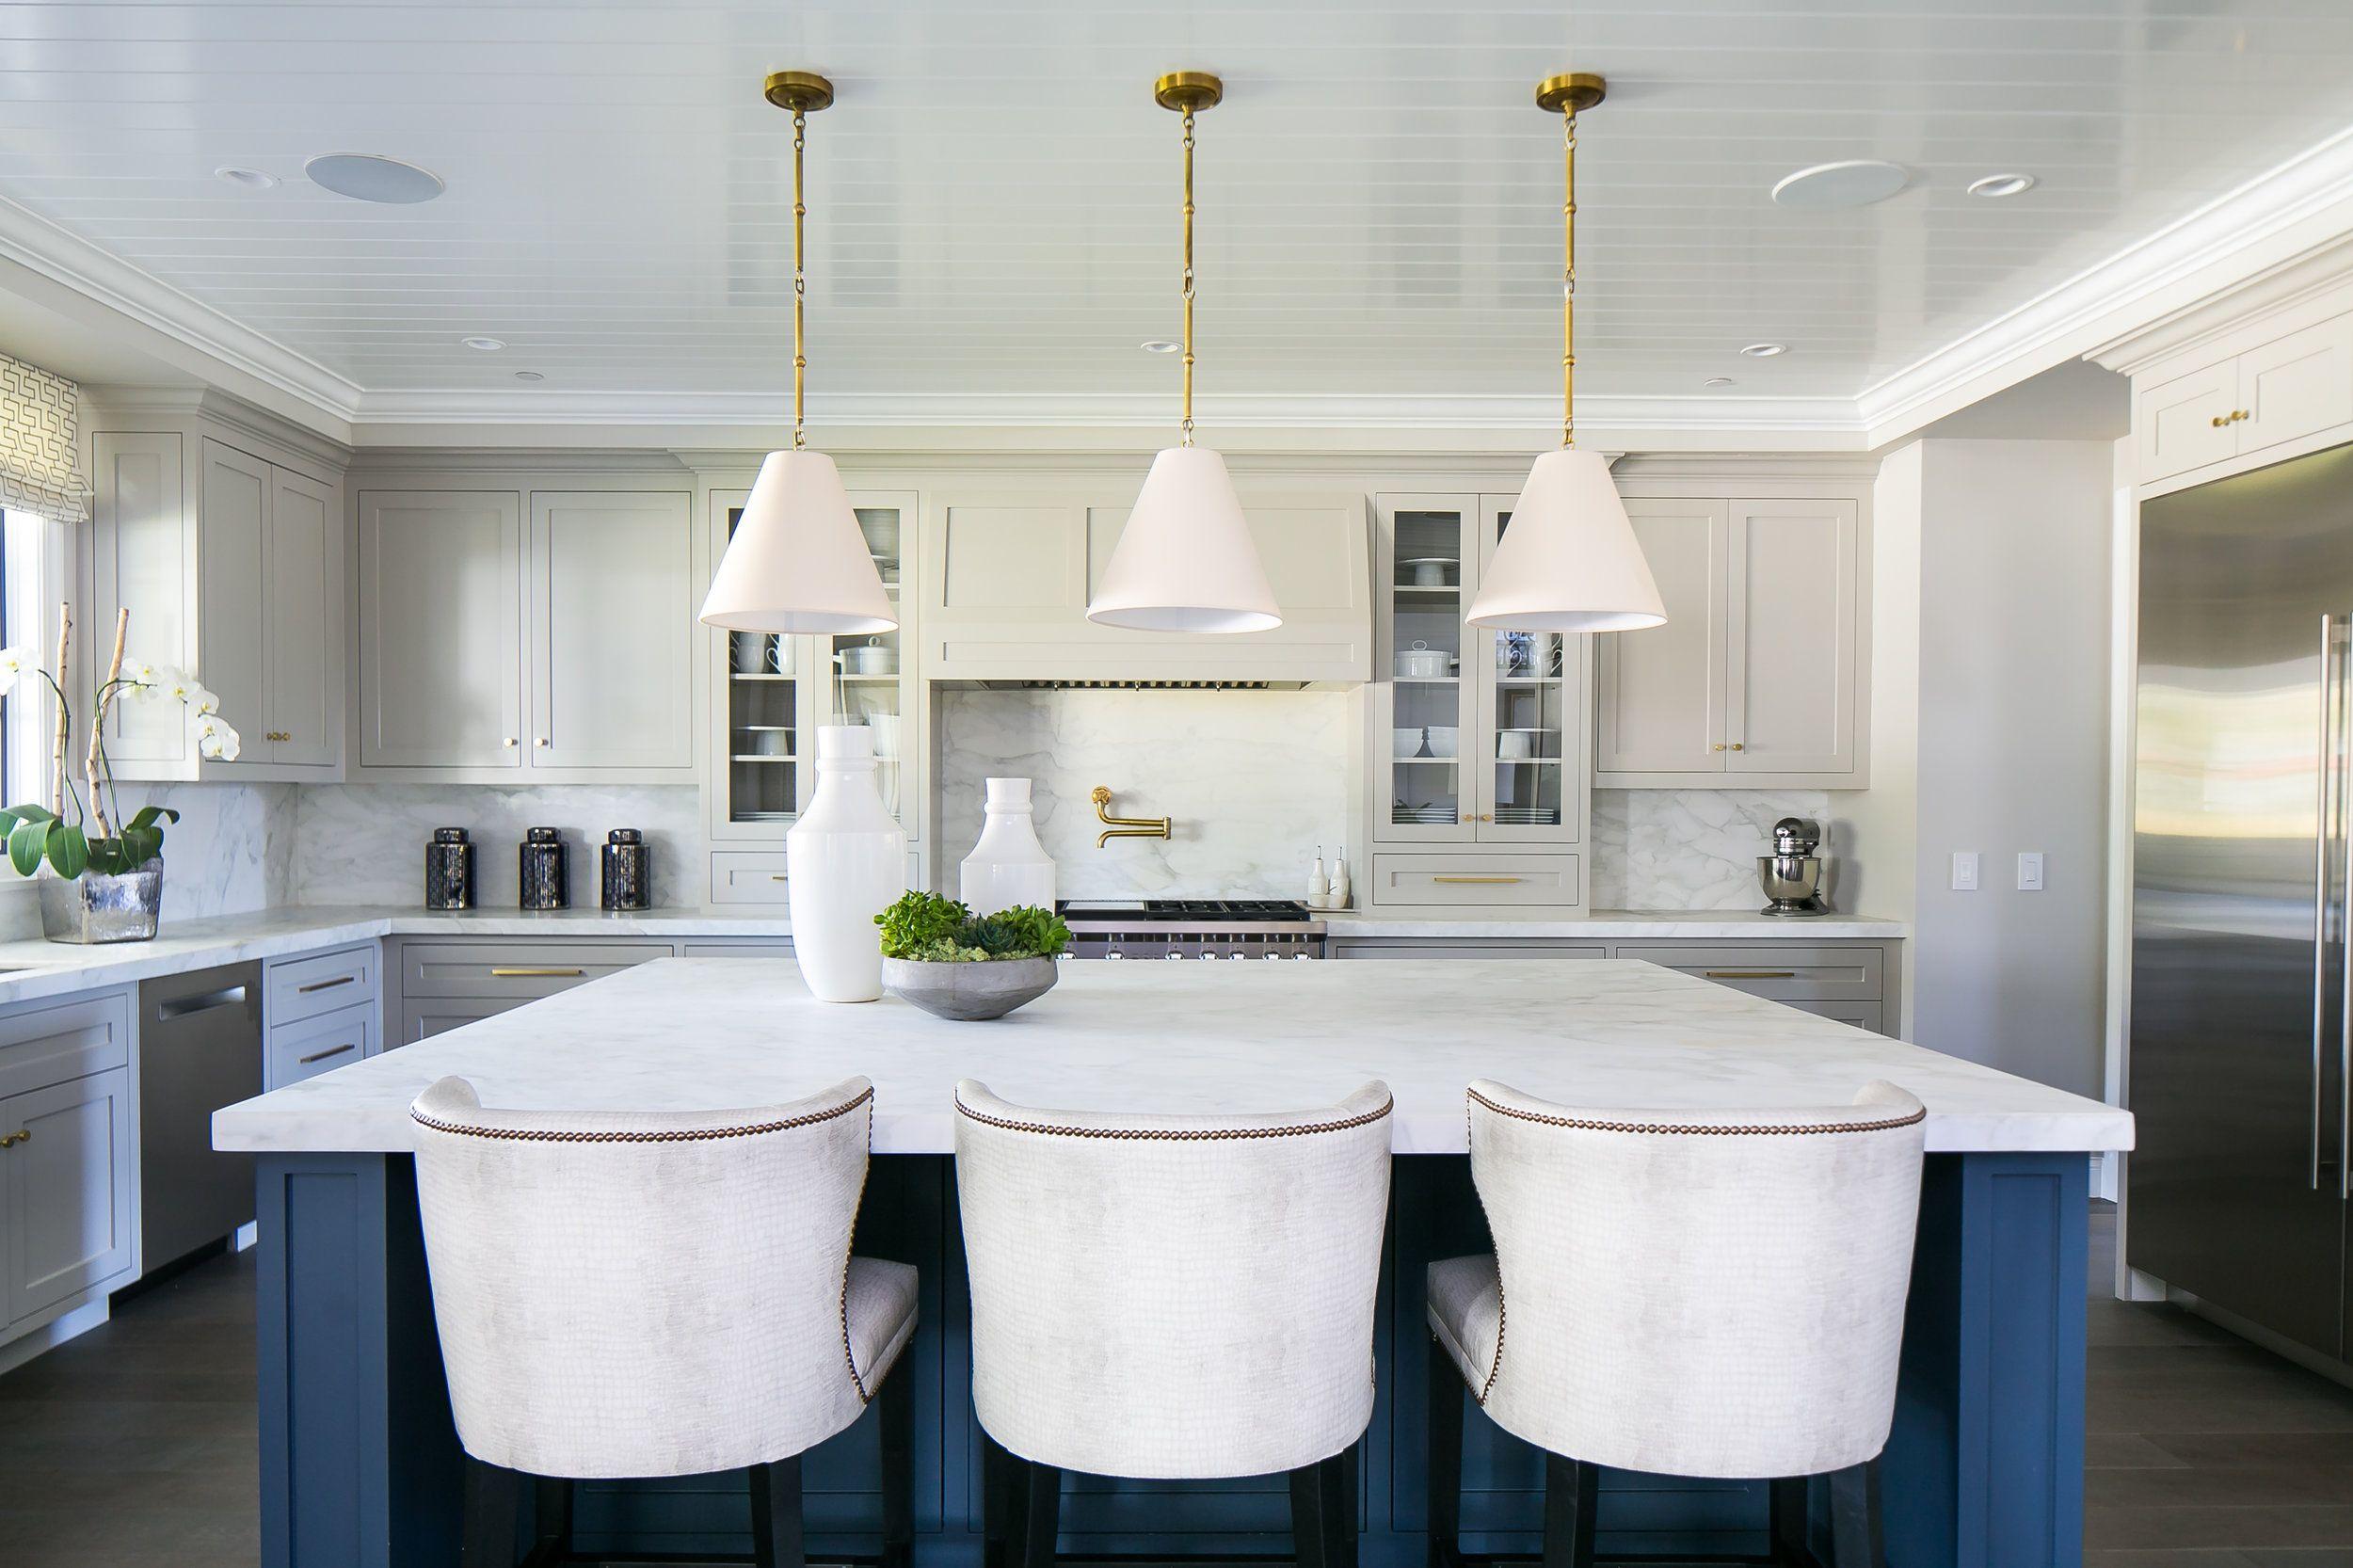 RGP-9020.JPG | Kitchen | Pinterest | Kitchens, Kitchen design and House